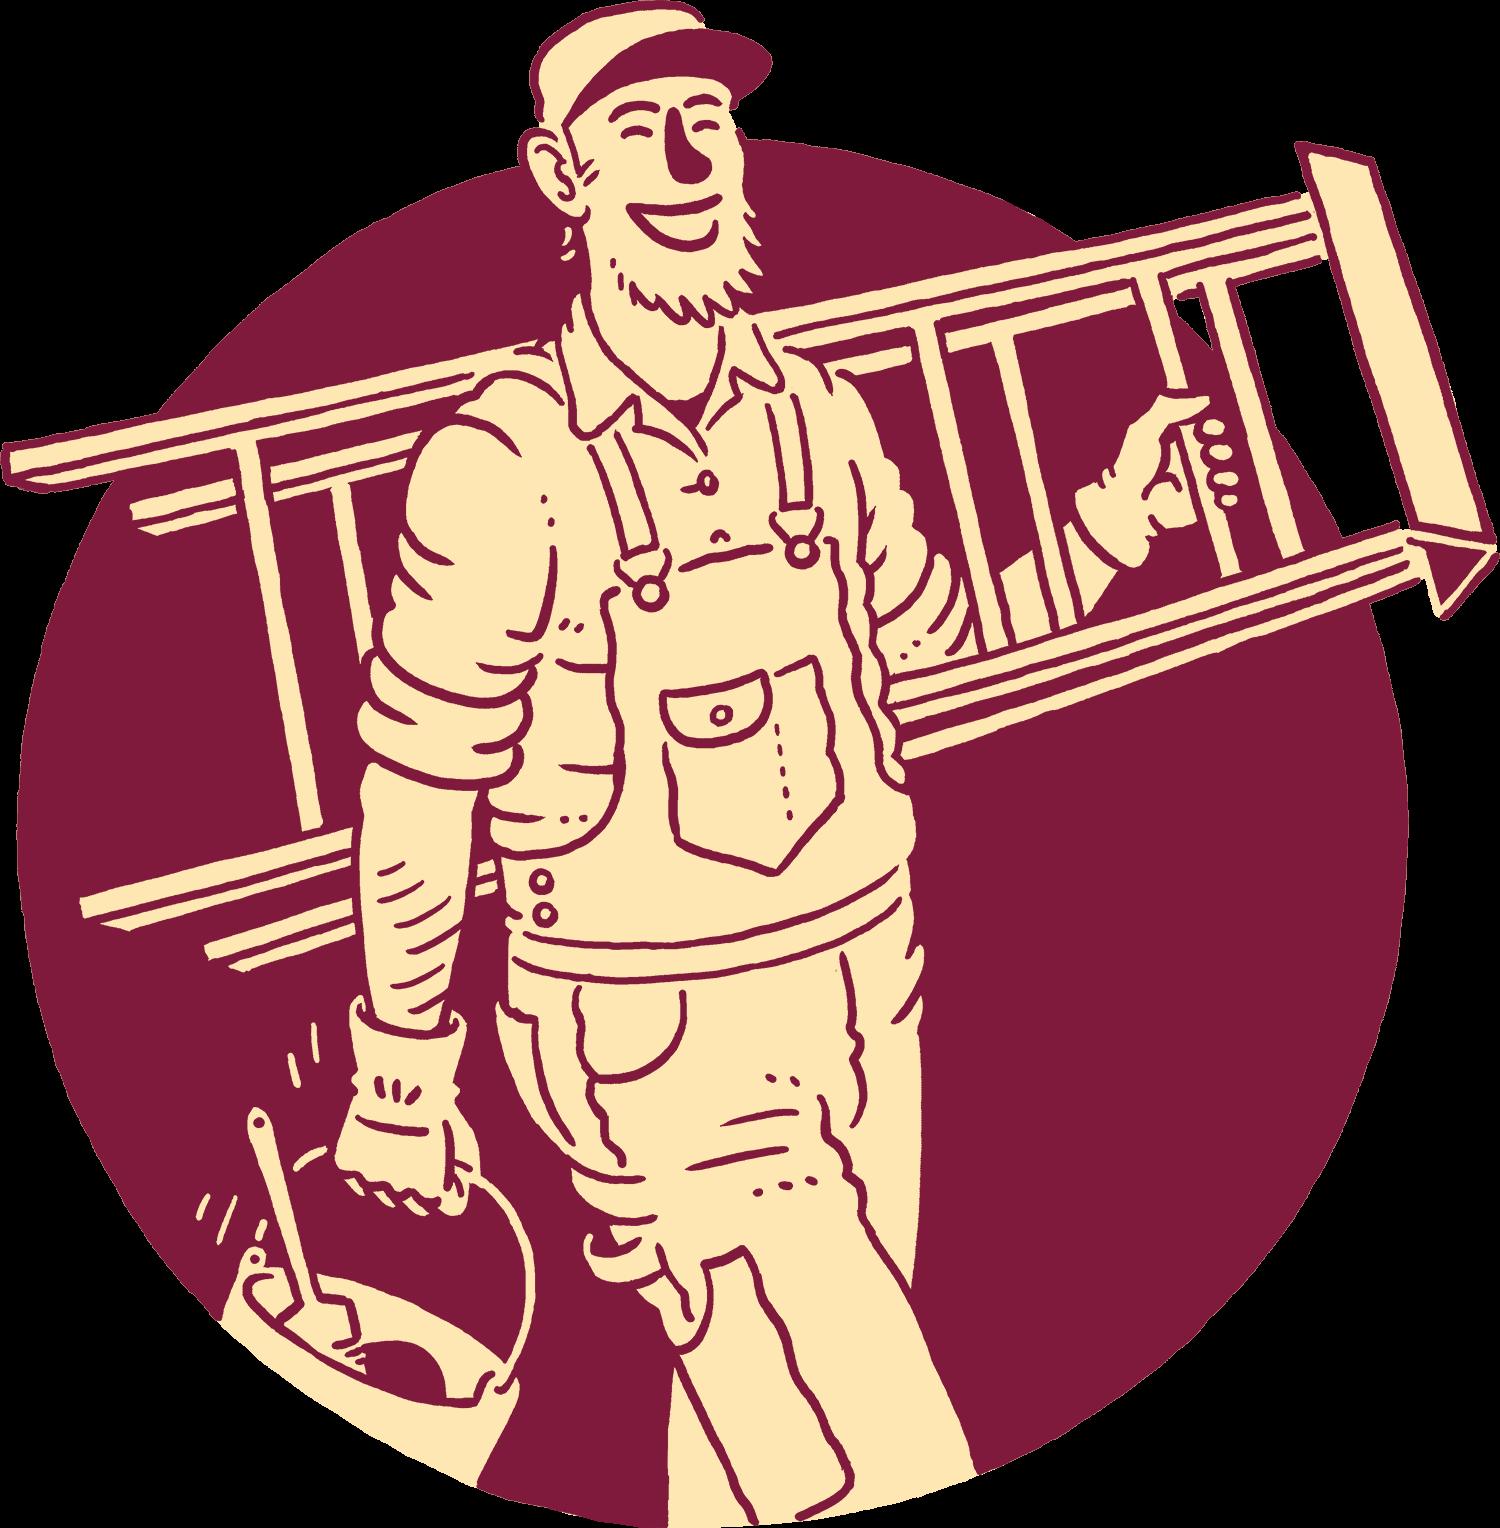 Illustration of happy painter